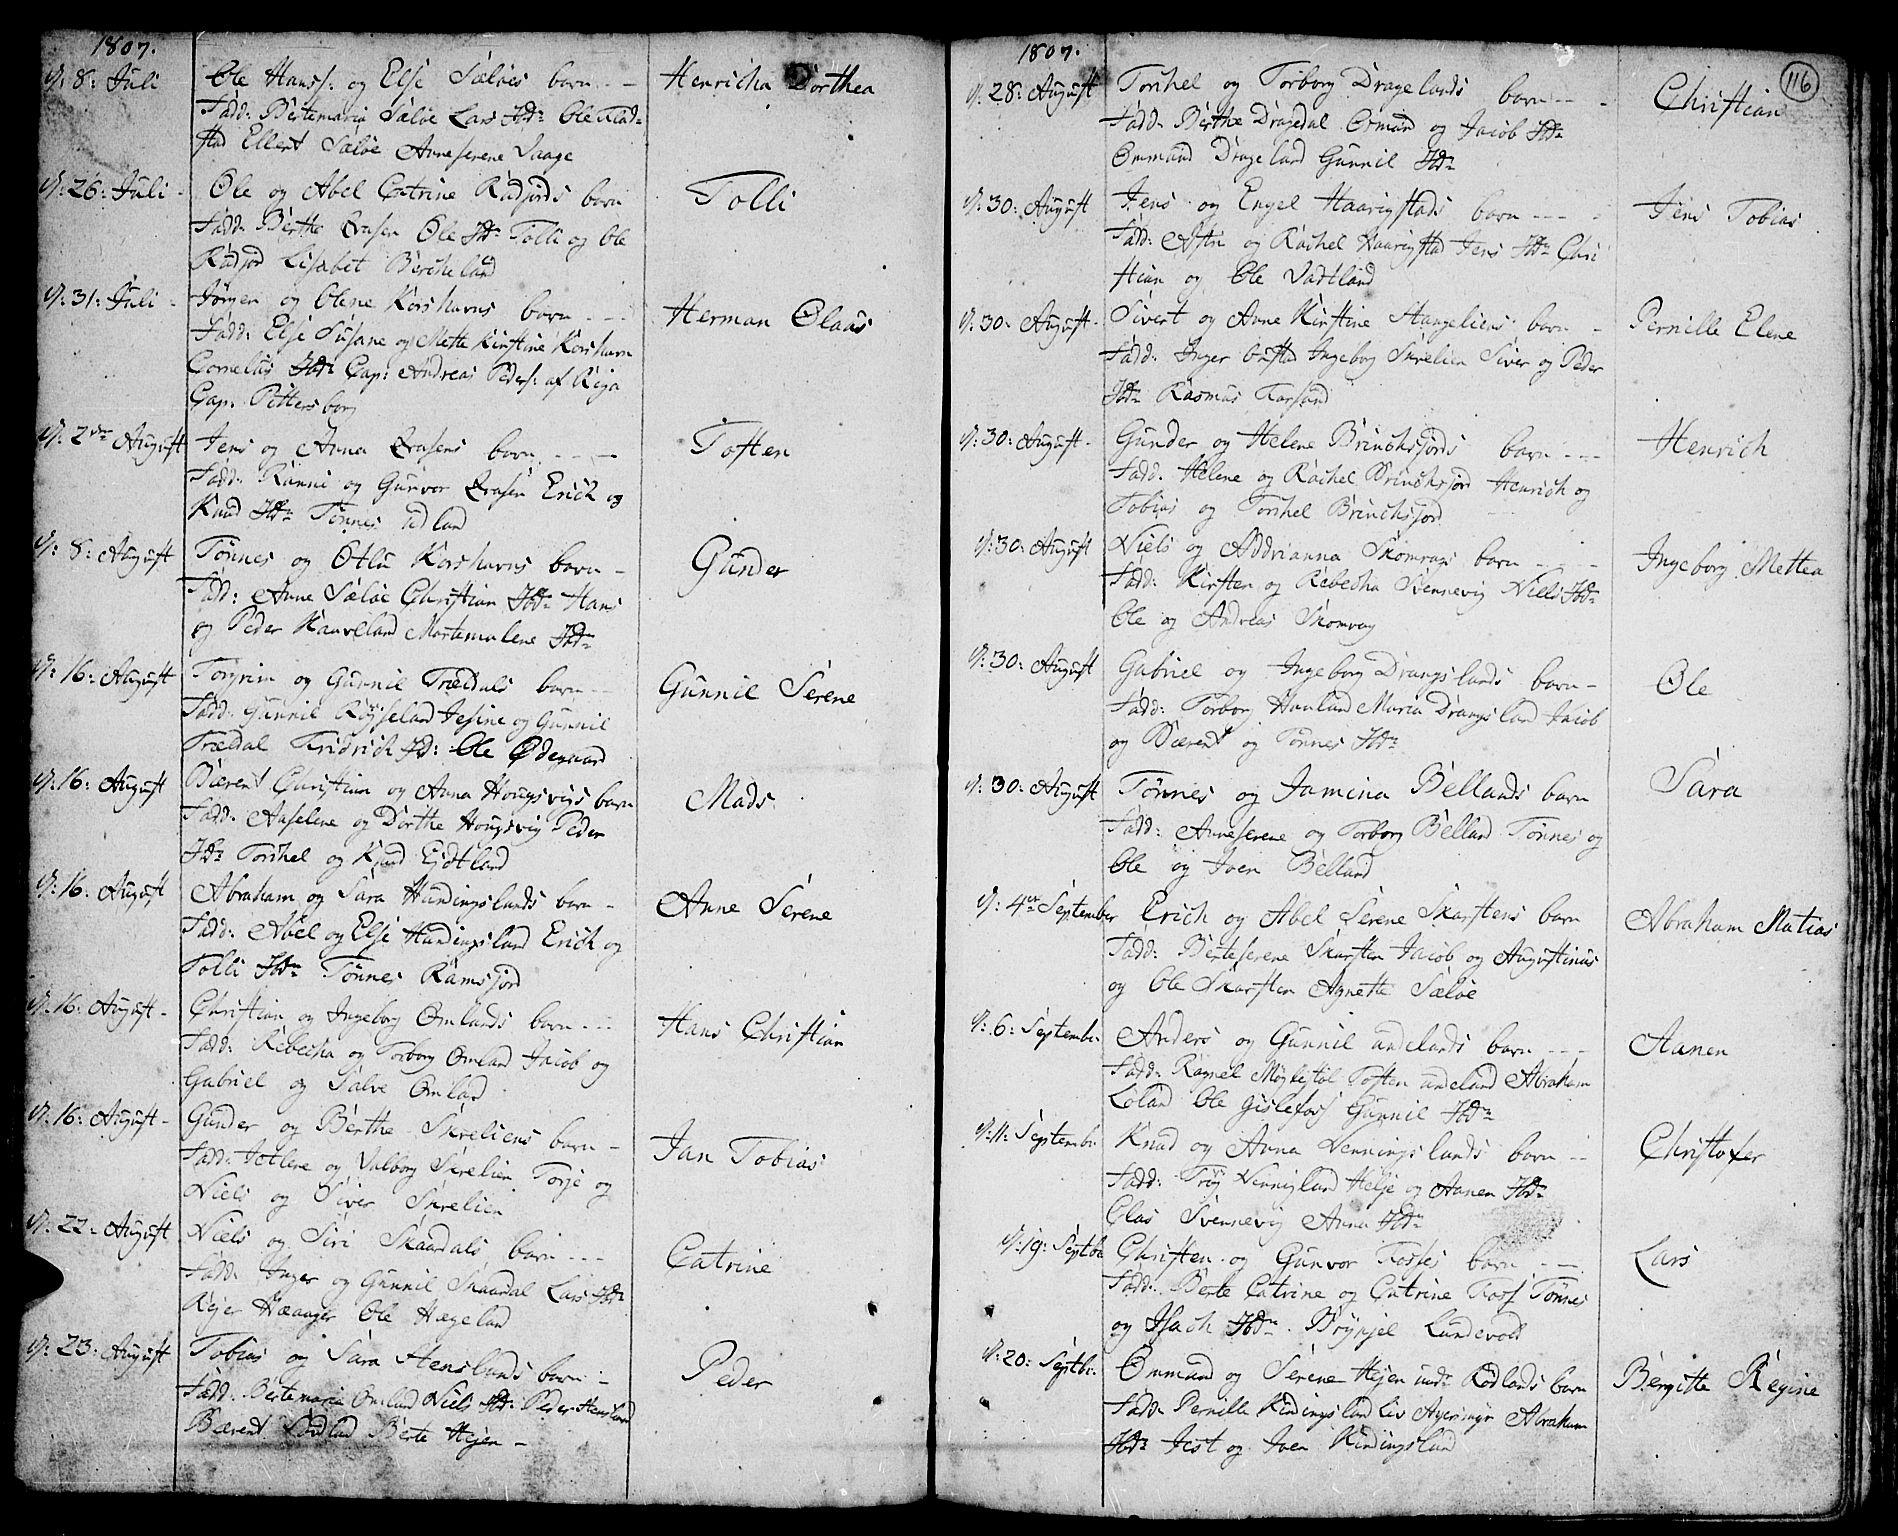 SAK, Lyngdal sokneprestkontor, F/Fa/Fac/L0004: Ministerialbok nr. A 4, 1780-1815, s. 116